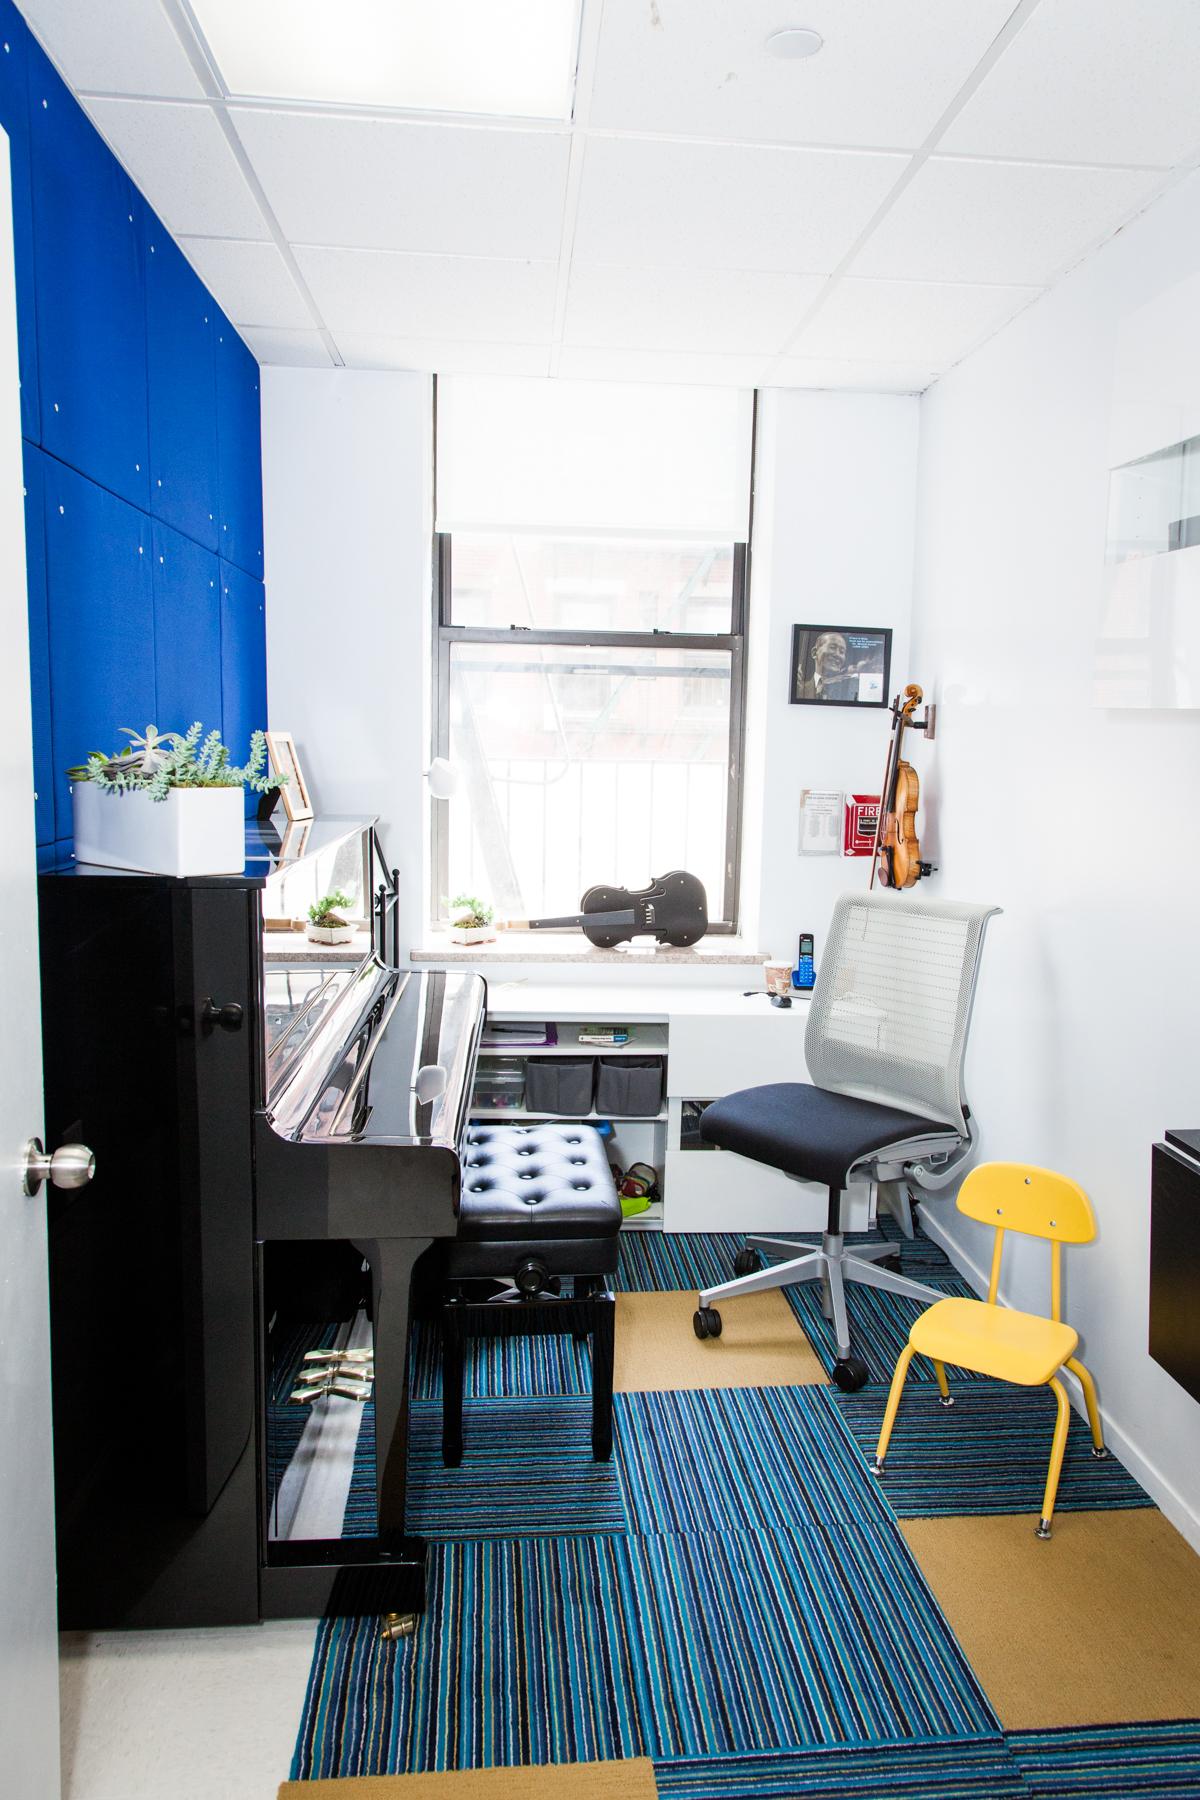 tone-academy-of-music-nyc-suzuki-practice-room.jpg